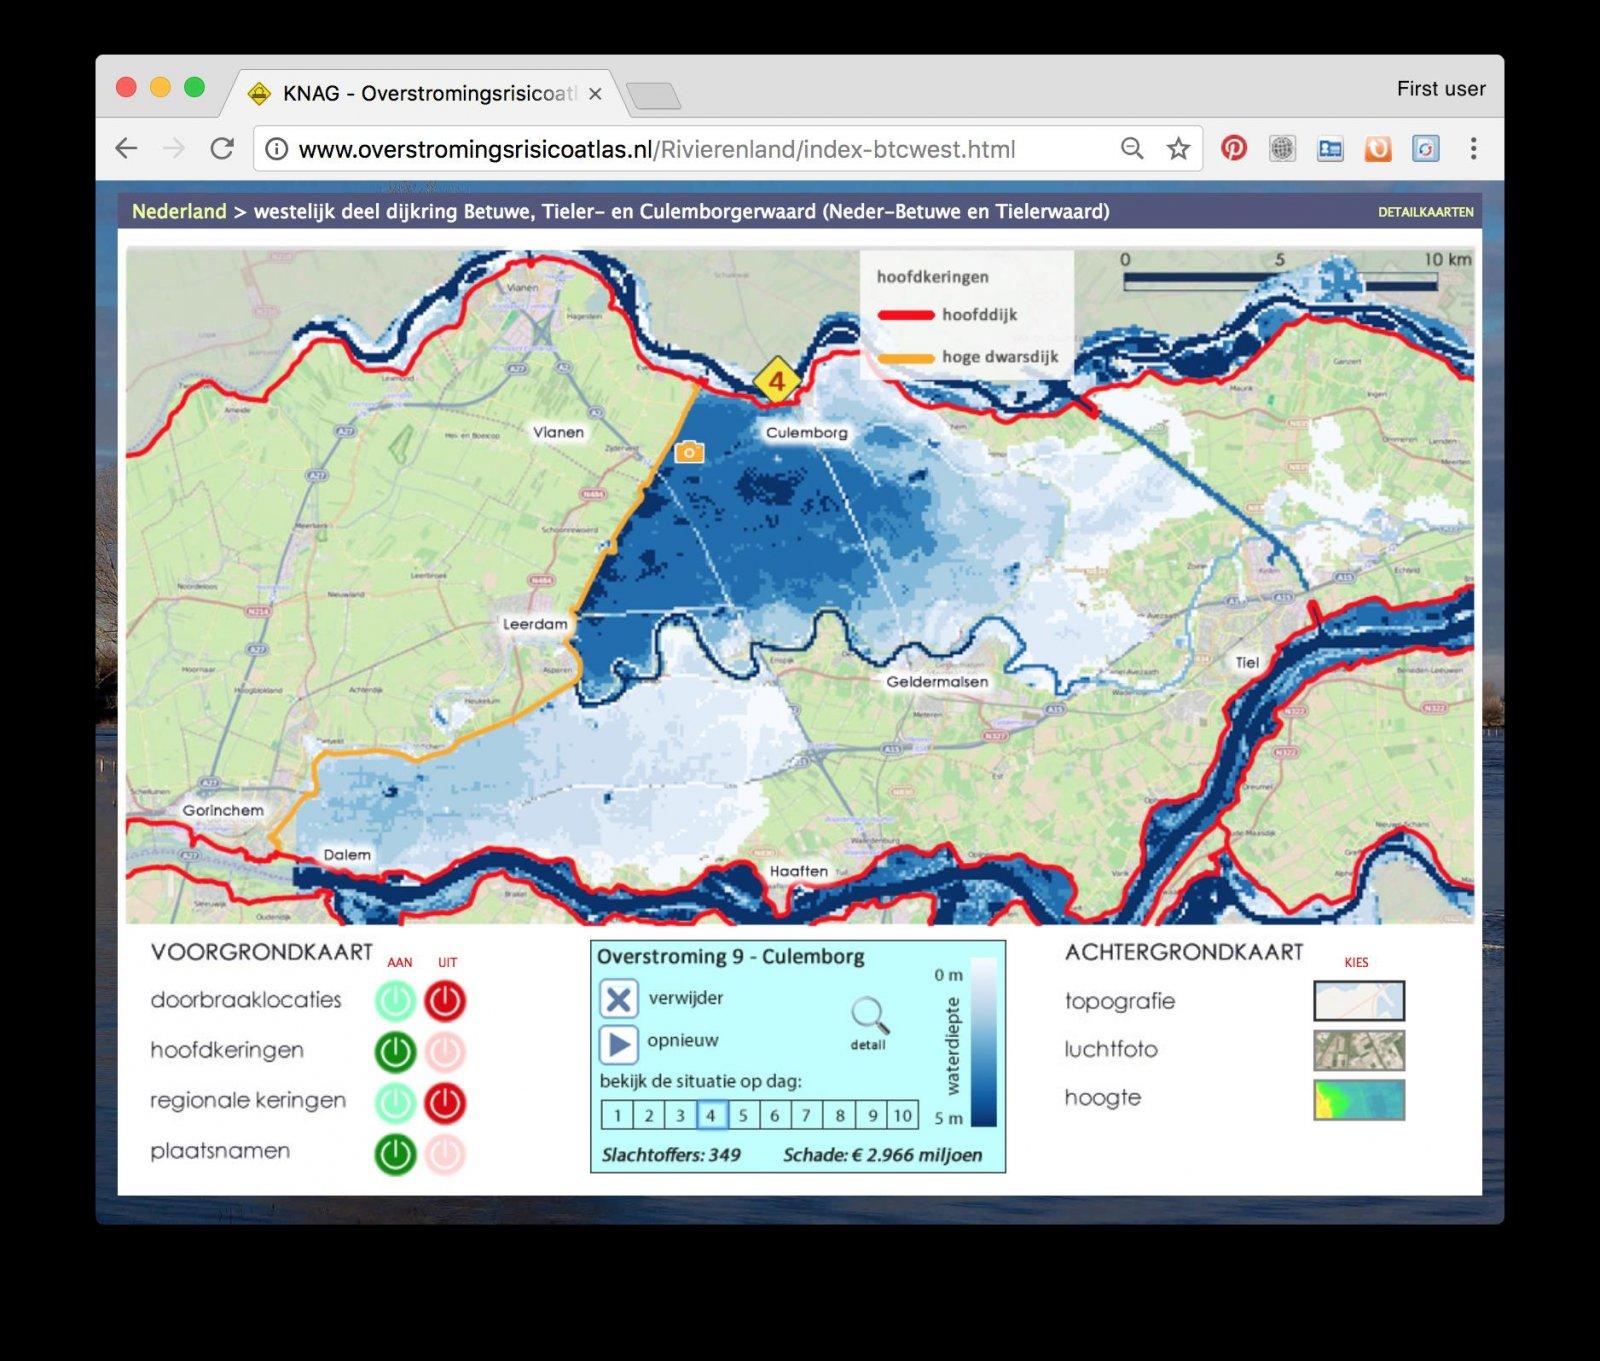 Screenshot showing flood models around Culemborg